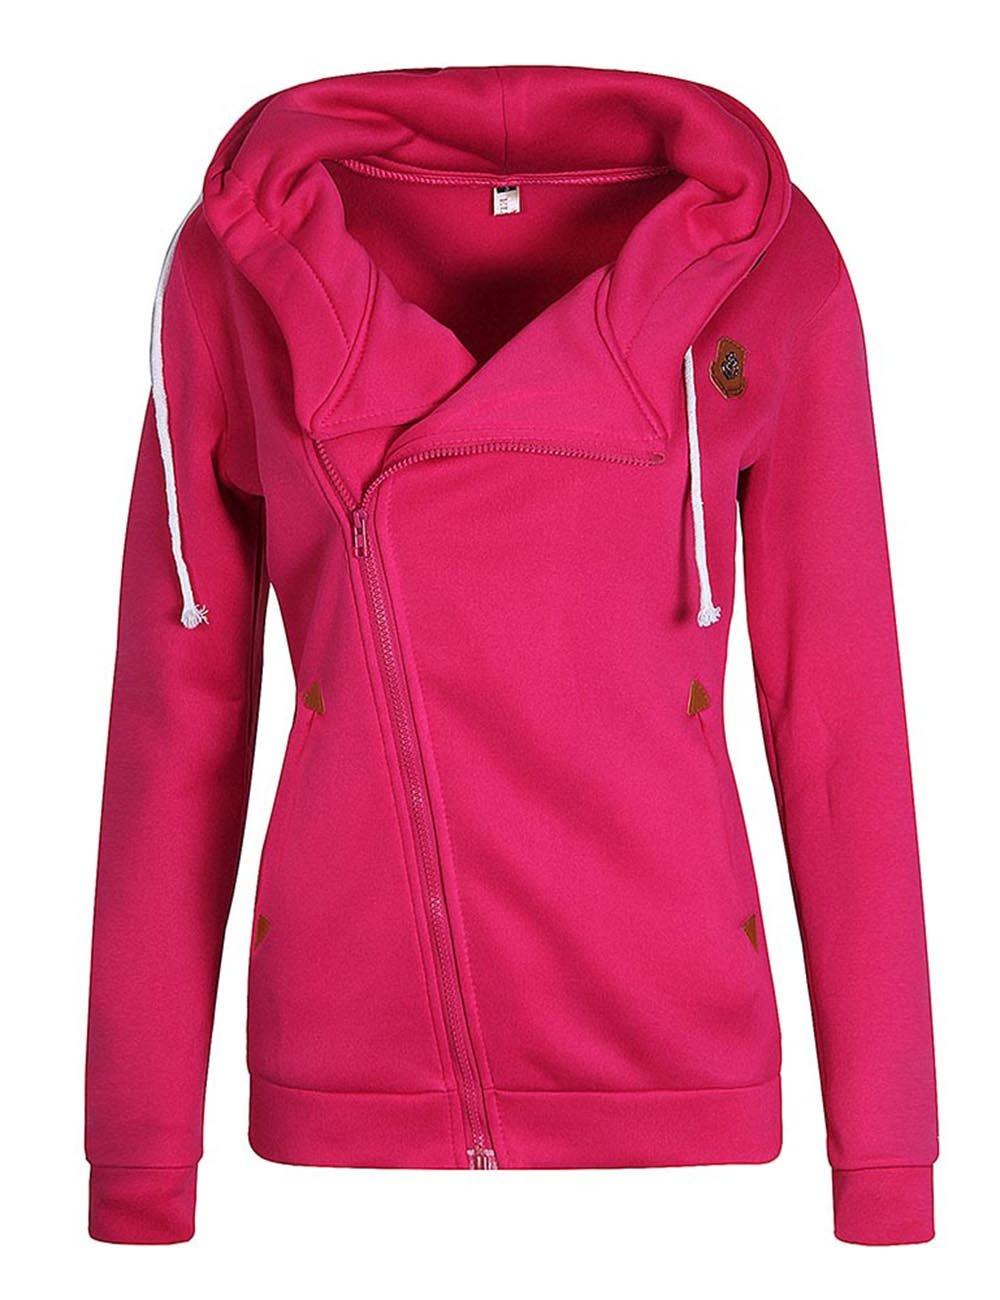 ELFIN Women's Long Sleeve Hoodies Sweatshirt Outwear Thick Hooded Pullover Jacket Top LN835